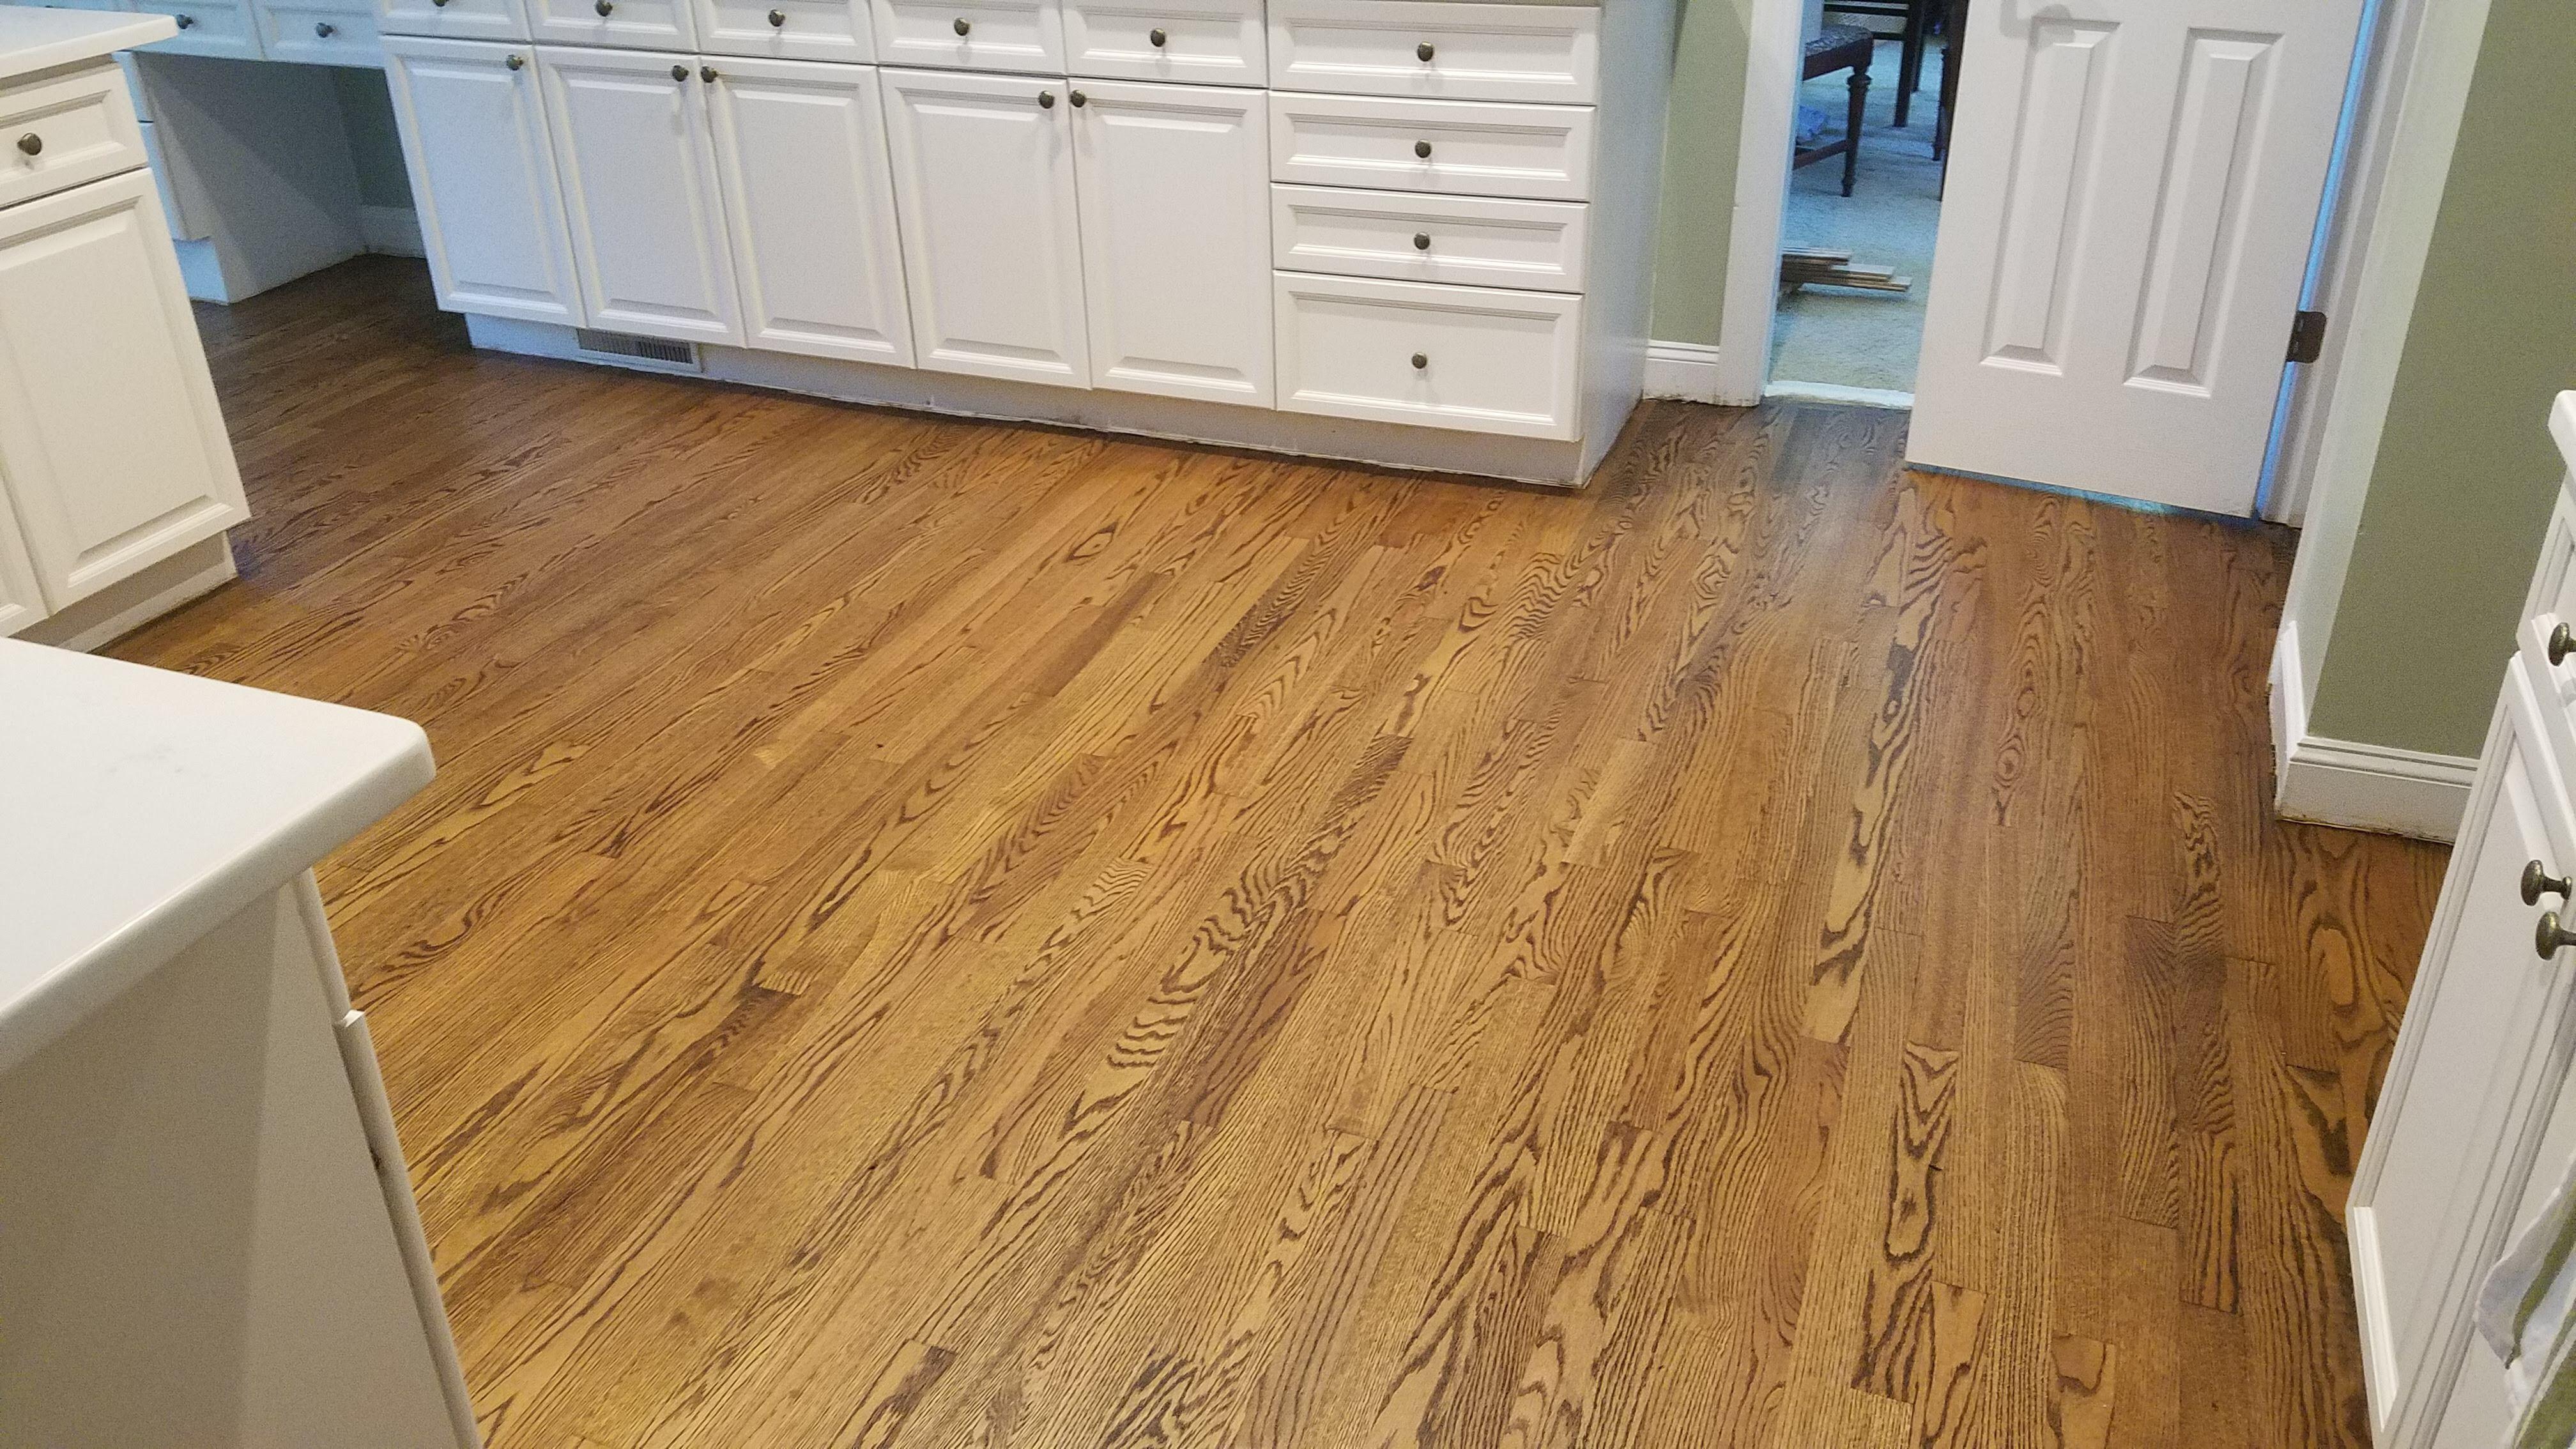 Bona Craft Oil 2k Clay Color On 2 1 4 Red Oak Hardwood Floors In Davidson Nc Oak Hardwood Flooring Red Oak Floors Flooring